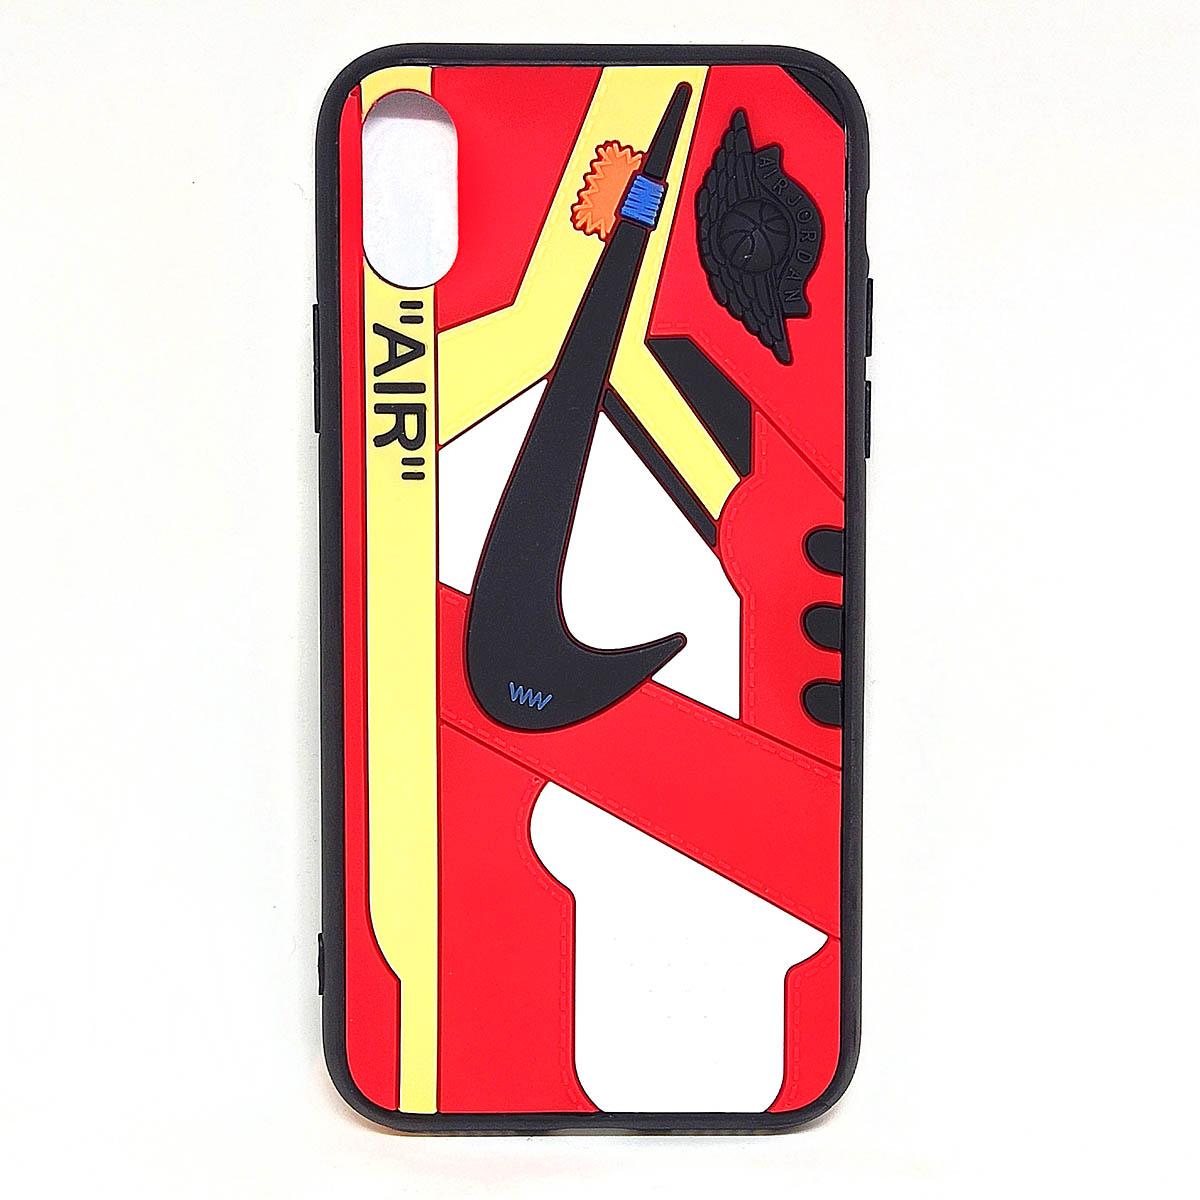 Cover AJ1 Chicago Air rossa per iphone X Xs, Xr, X Xs Max   Blacksheep Store